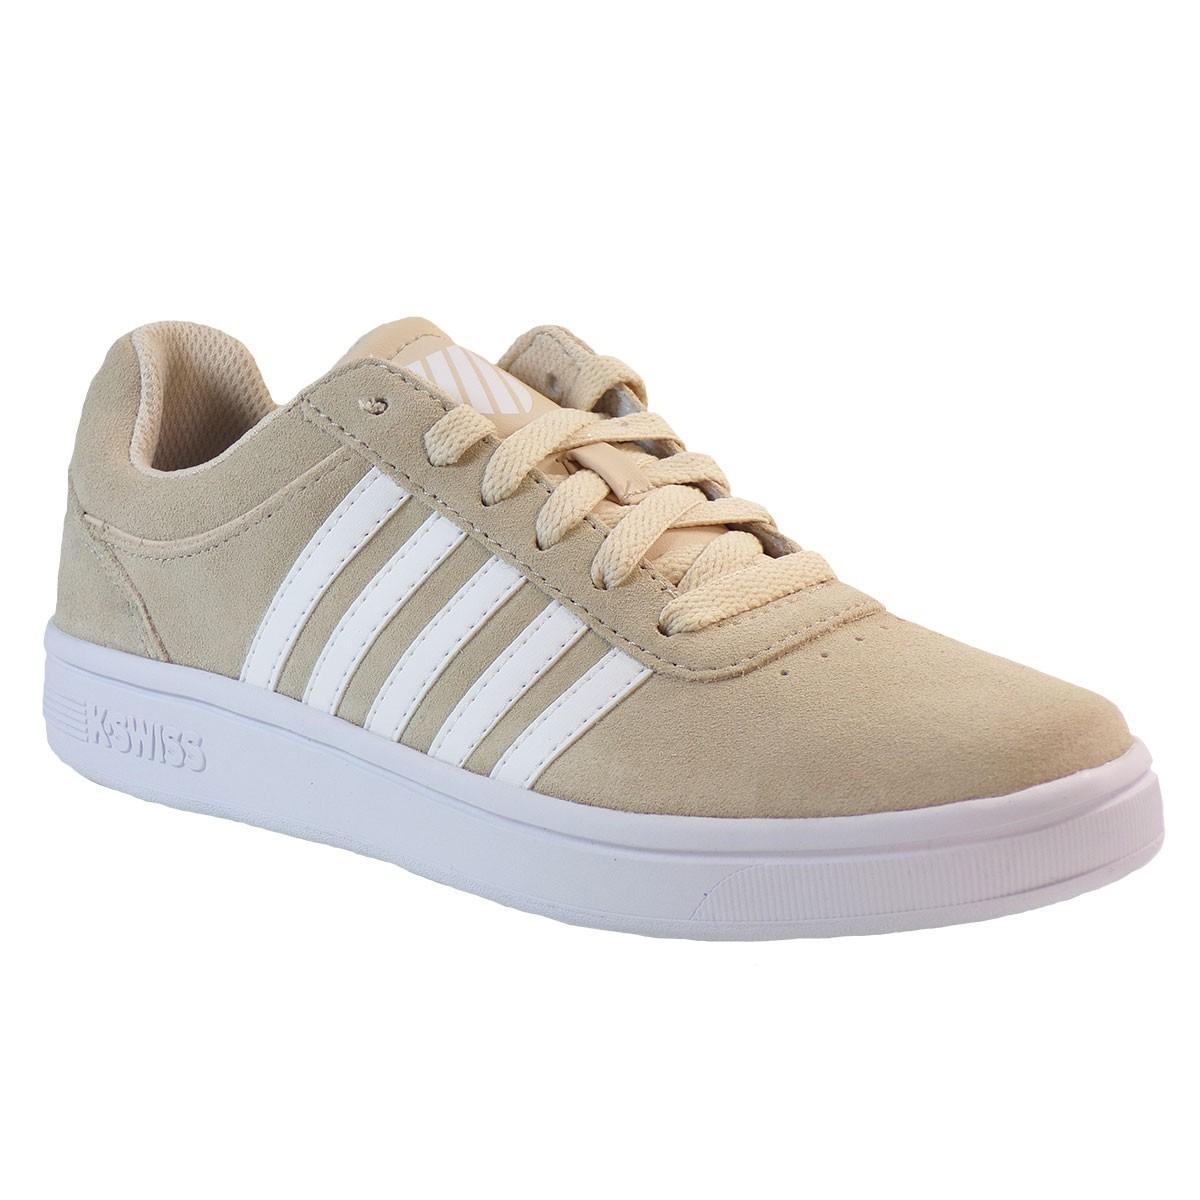 K-SWISS Γυναικεία Παπούτσια Sneakers 95676-271 Μπεζ 887292414